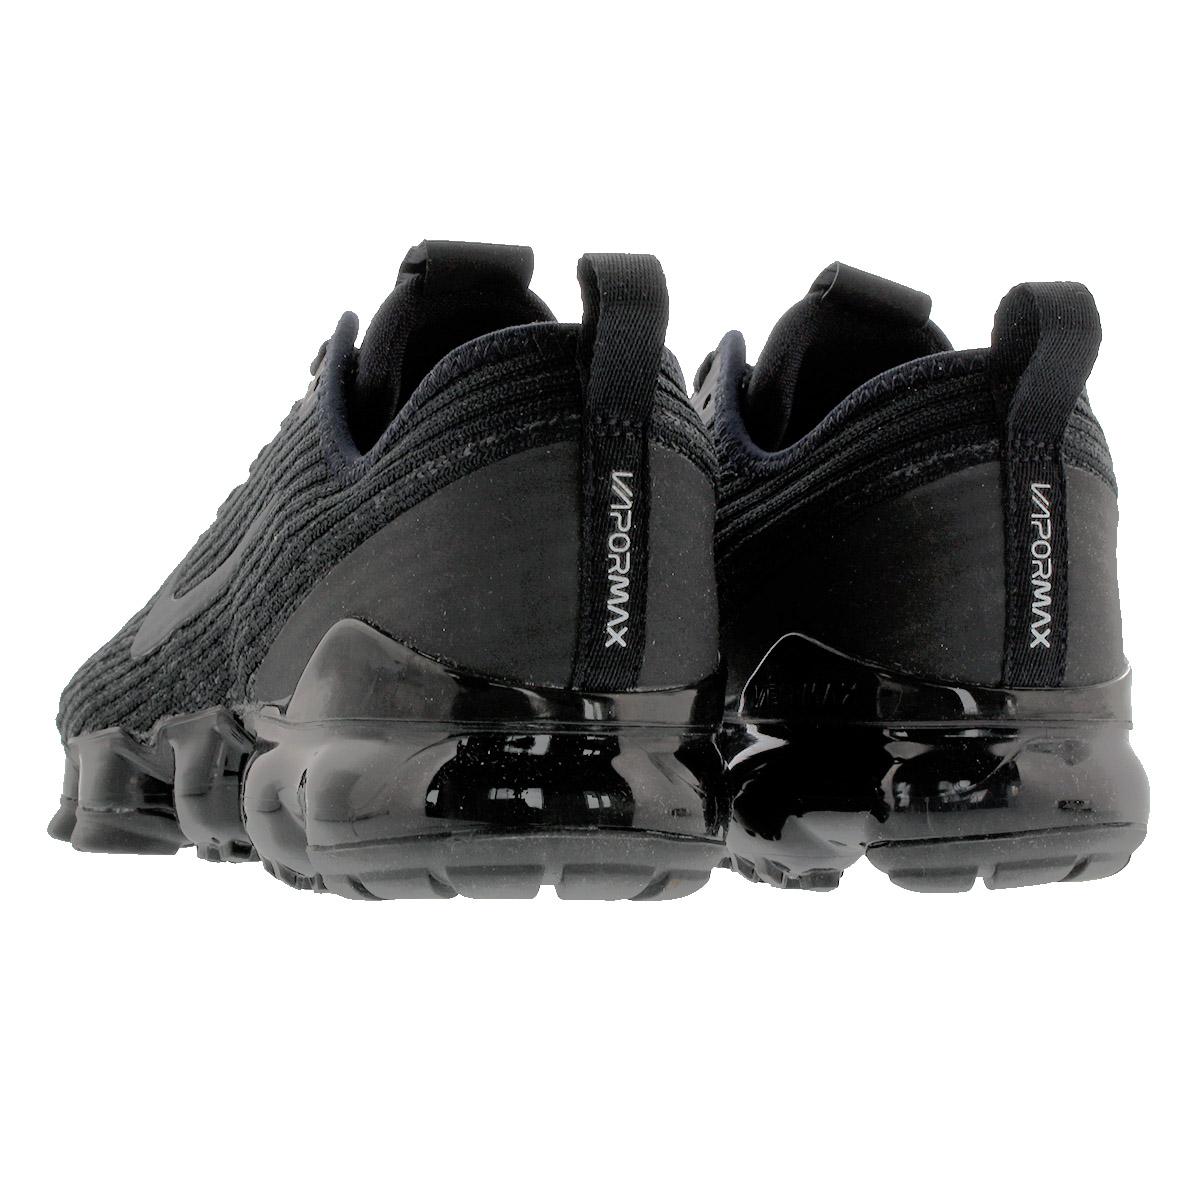 NIKE AIR VAPORMAX FLYKNIT 3 GS Nike air vapor max fried food knit 3 GS BLACKANTHRACITE bq5238 001